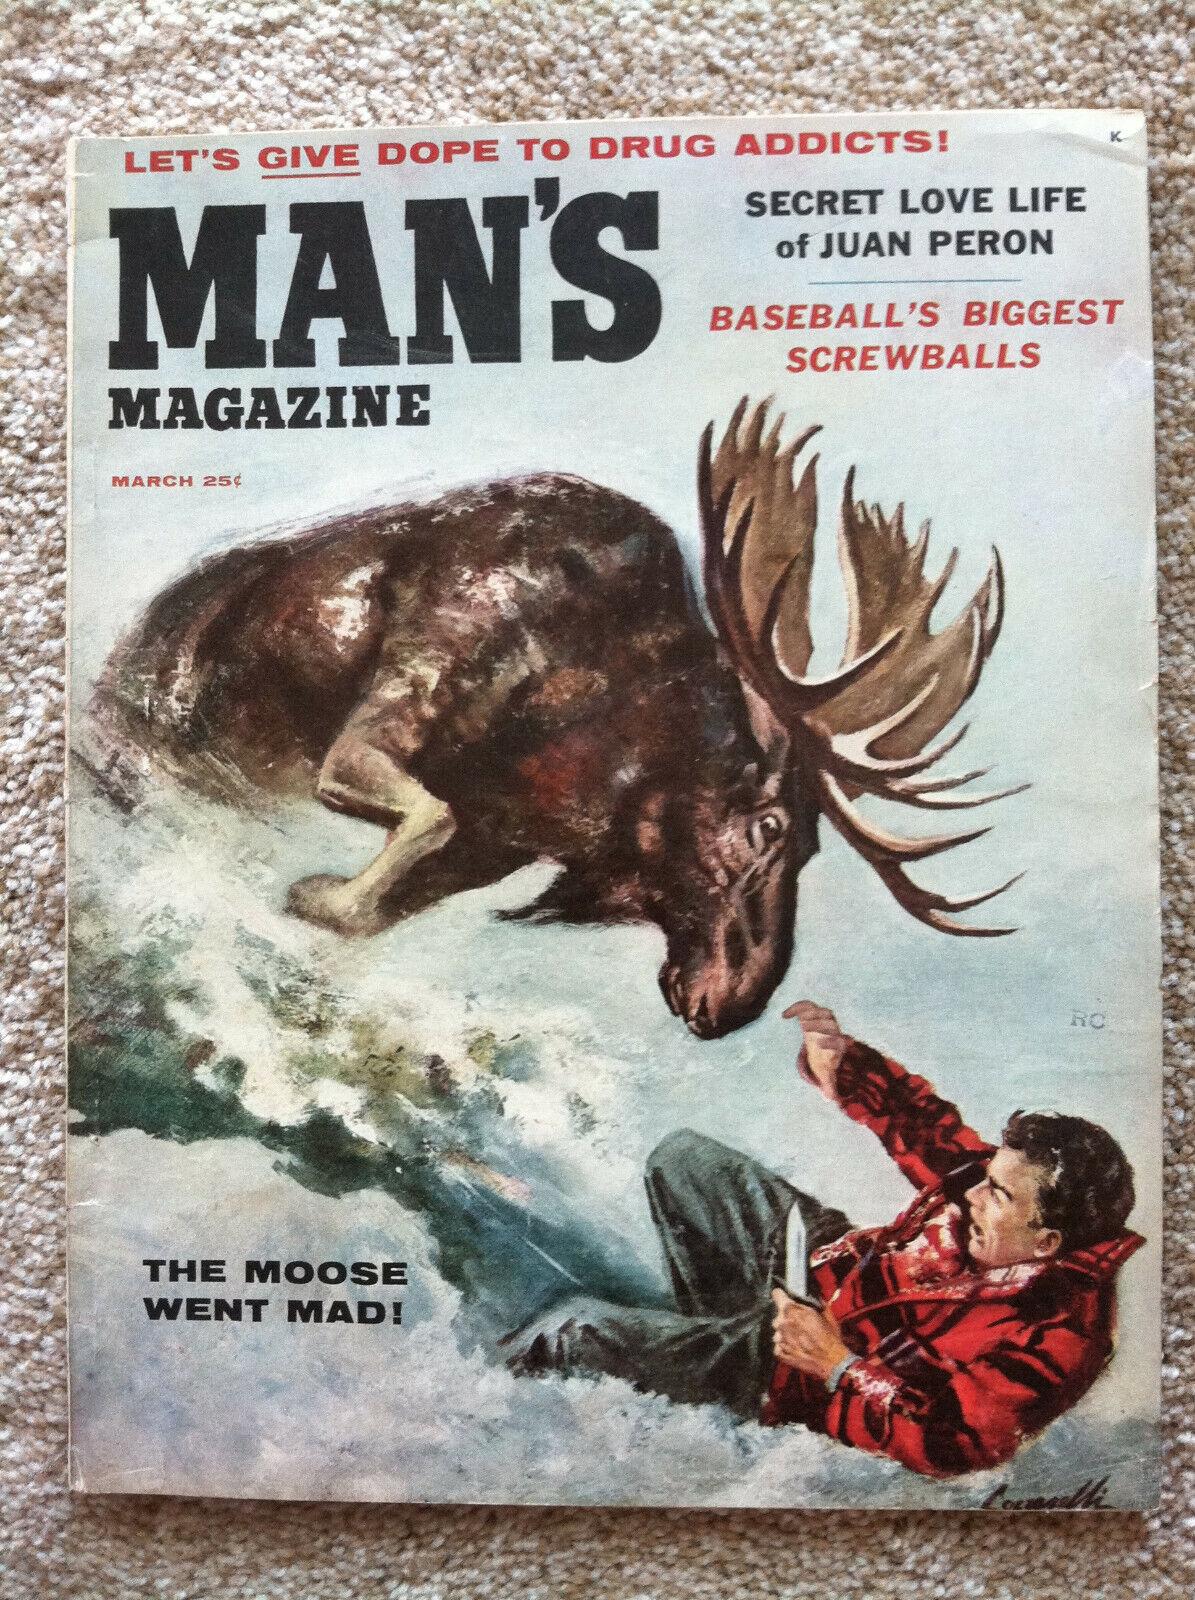 Man s Magazine March 1956 - Men s Adventure Magazine - Animal Attack Cover - $43.00